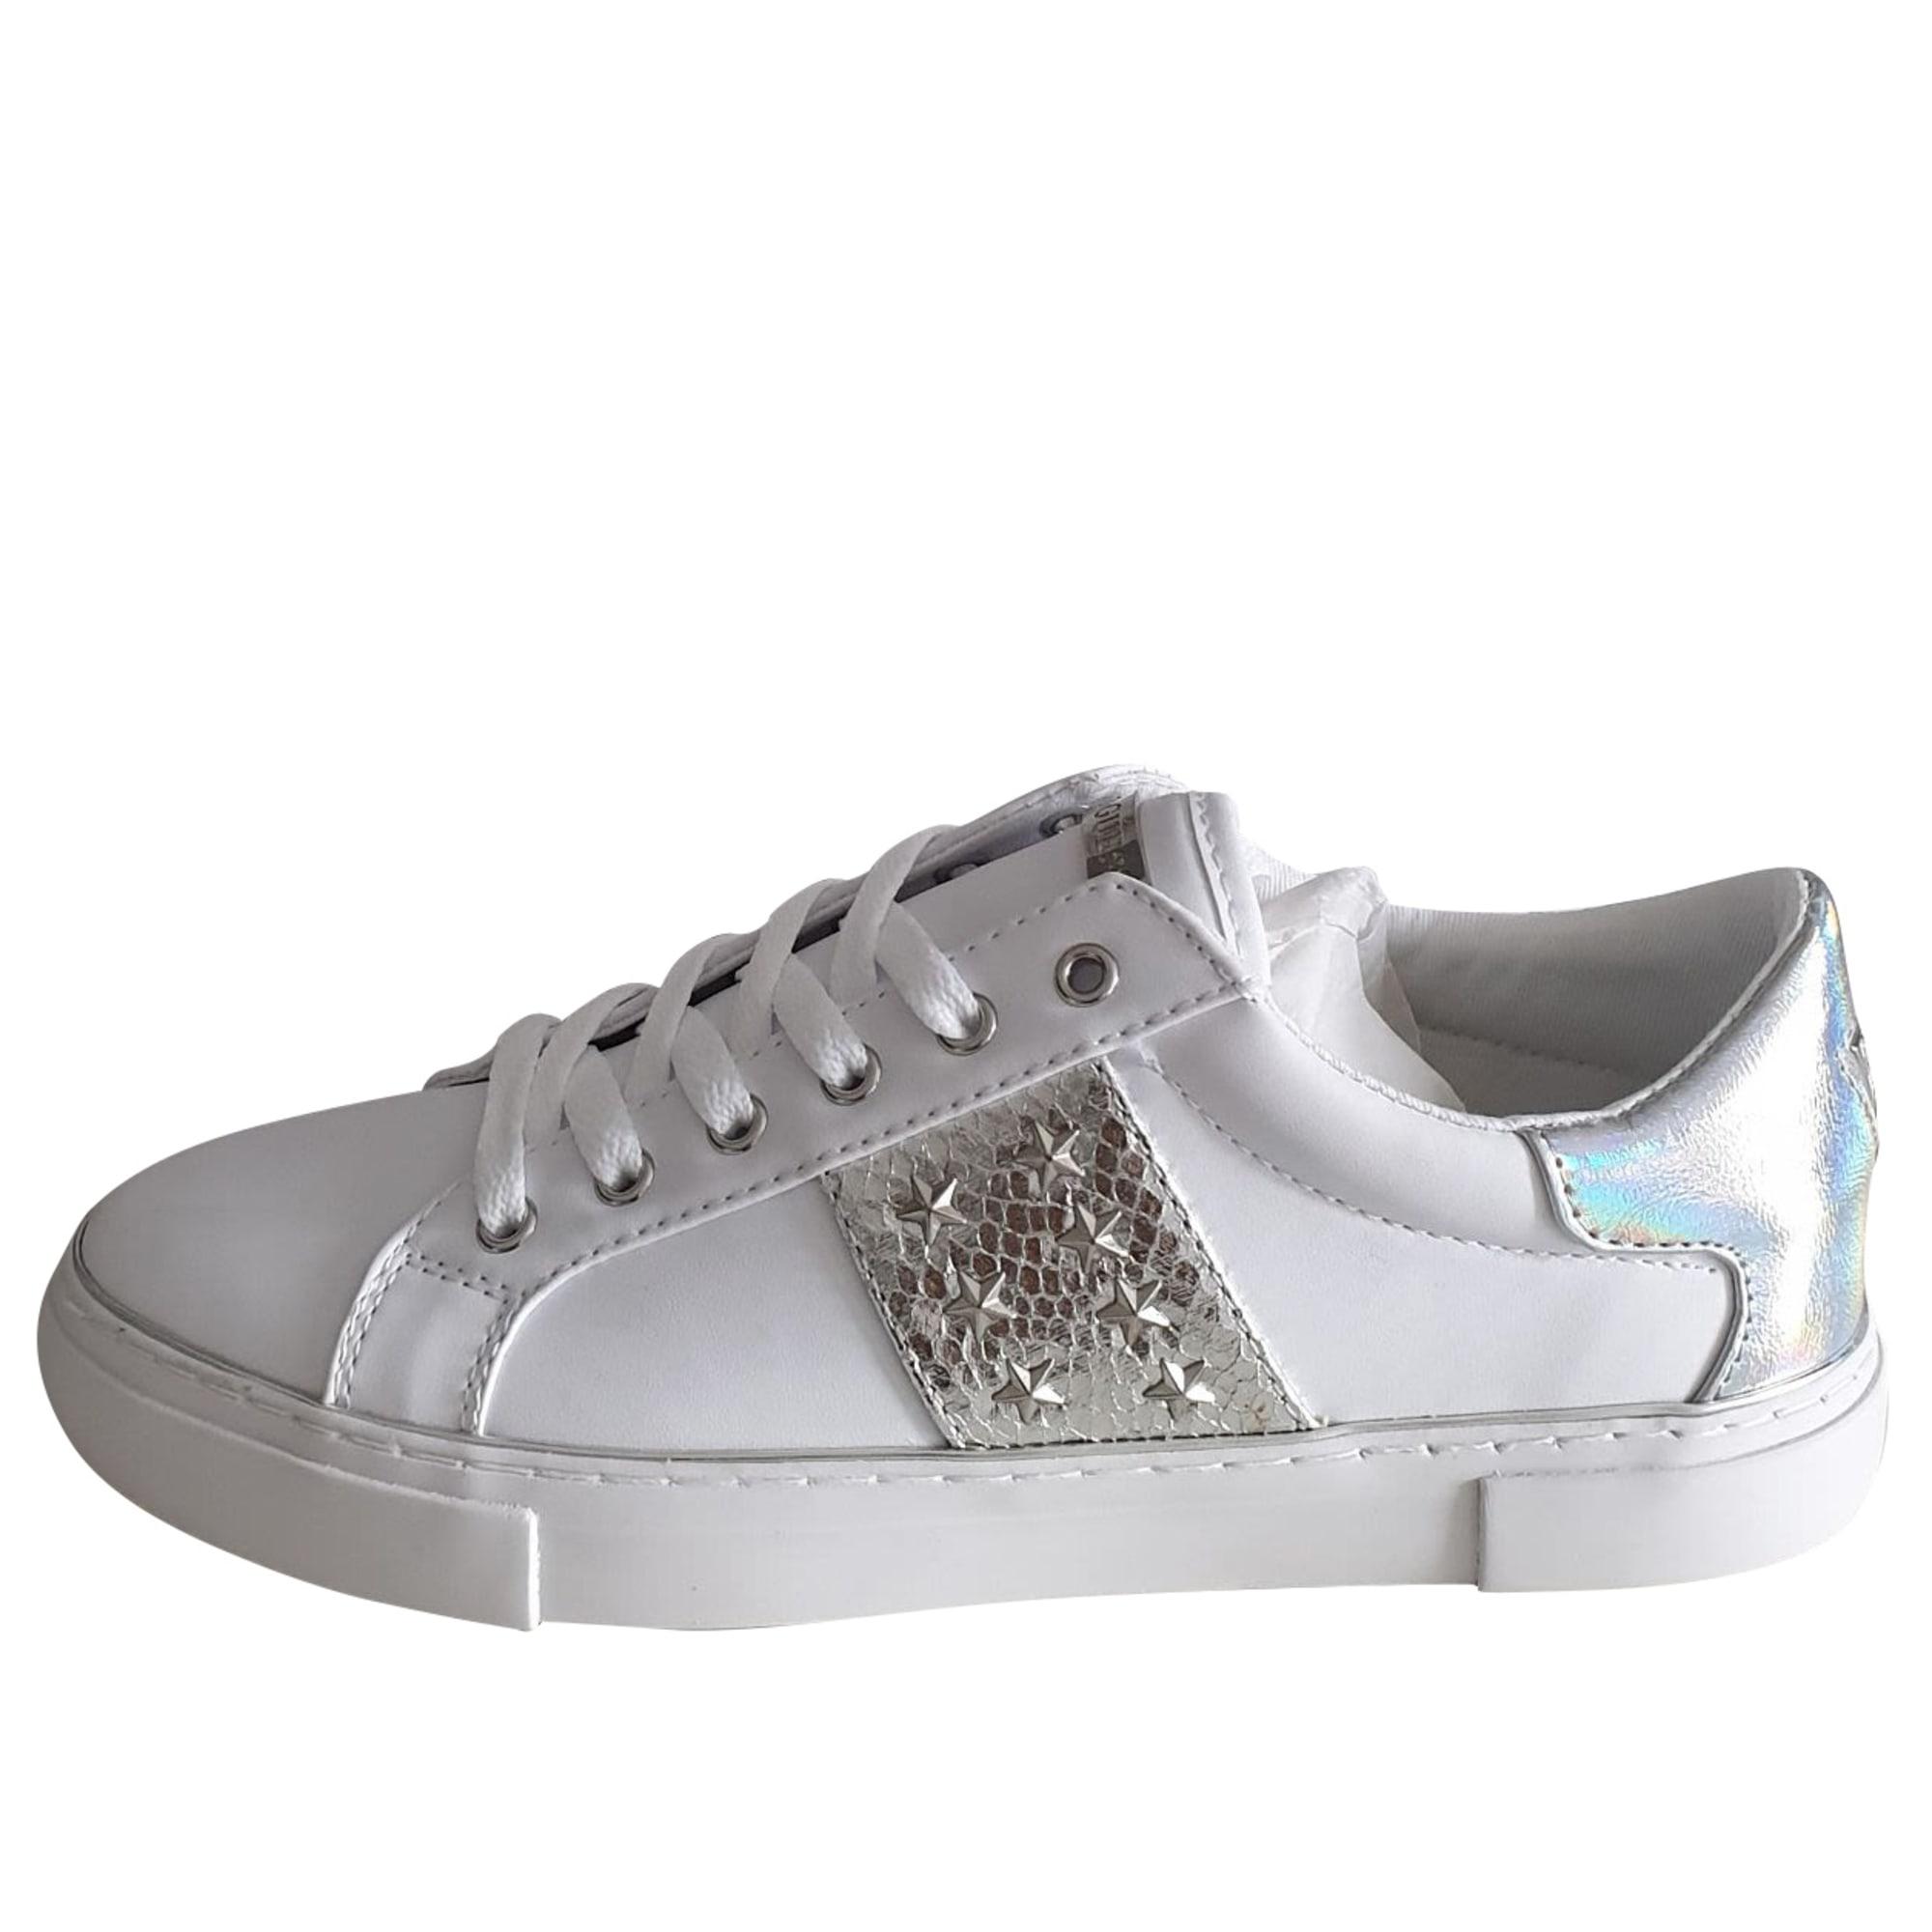 Sneakers GUESS White, off-white, ecru